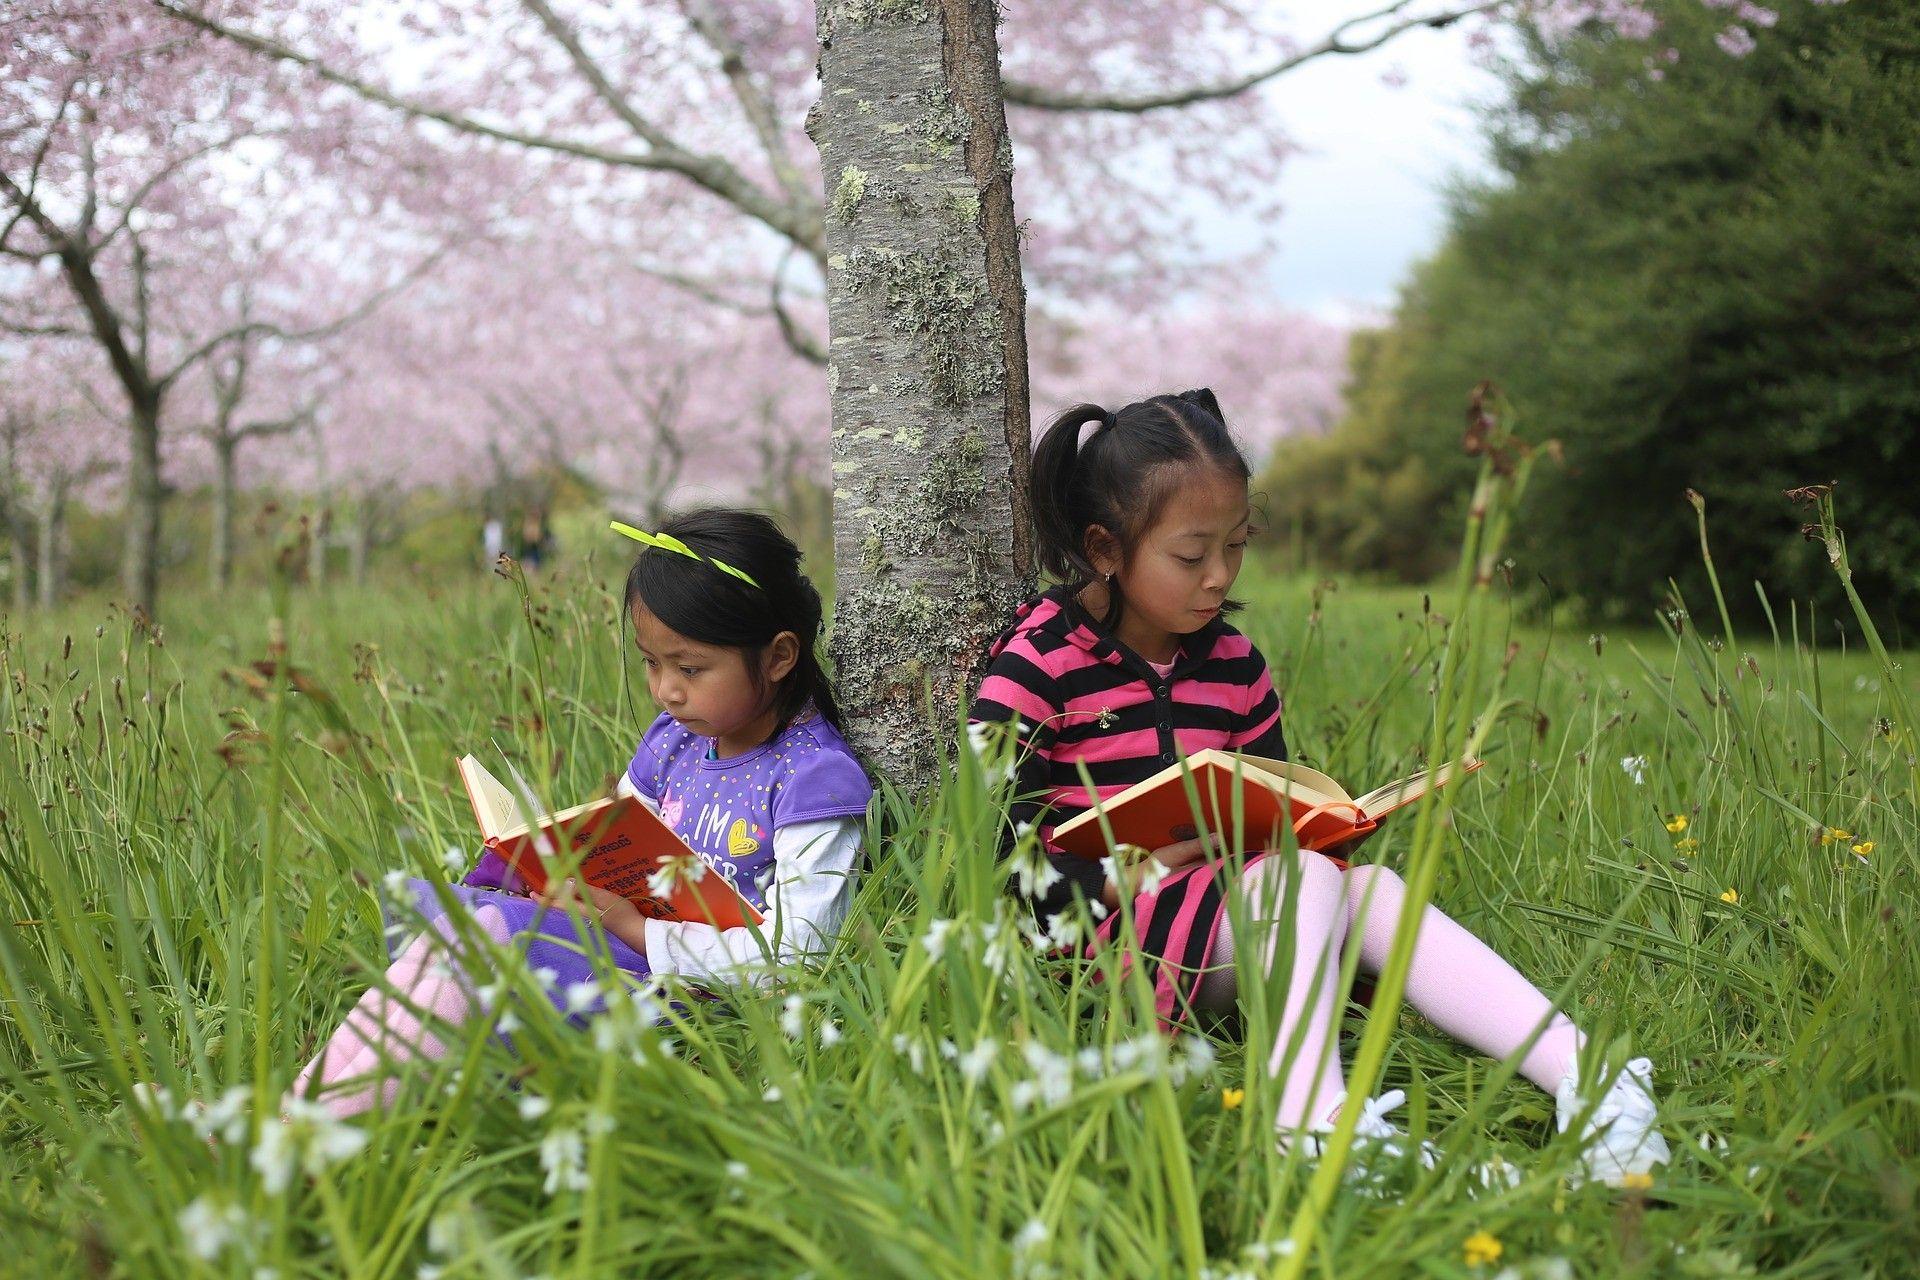 Gardening Books For Kids - Growing Healthy Kids in 2020 ...